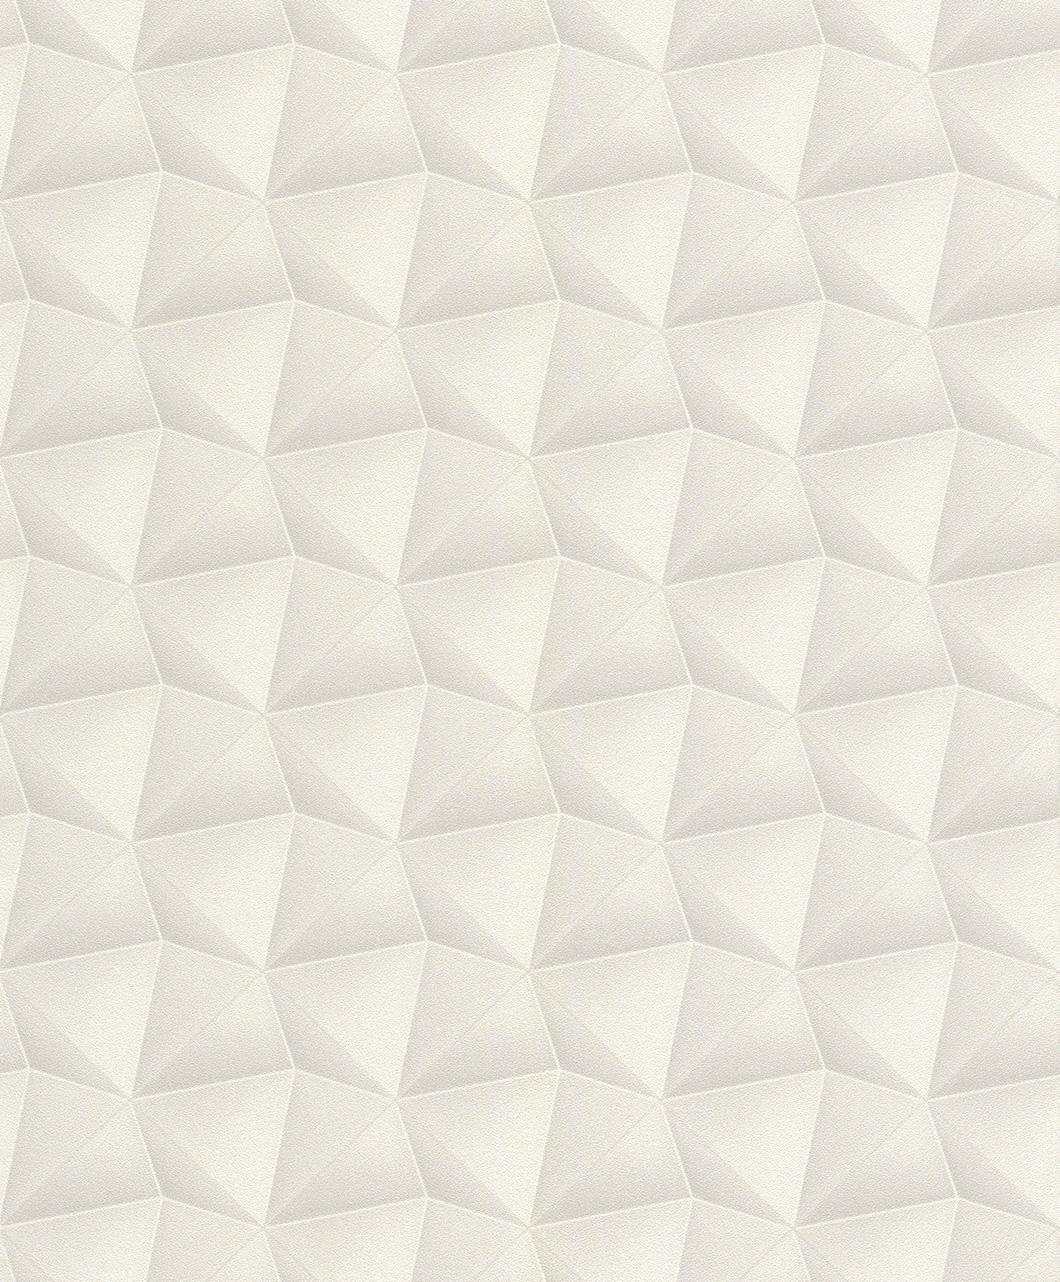 vliestapete rasch deco style 3d waben grau glitzer 504644. Black Bedroom Furniture Sets. Home Design Ideas